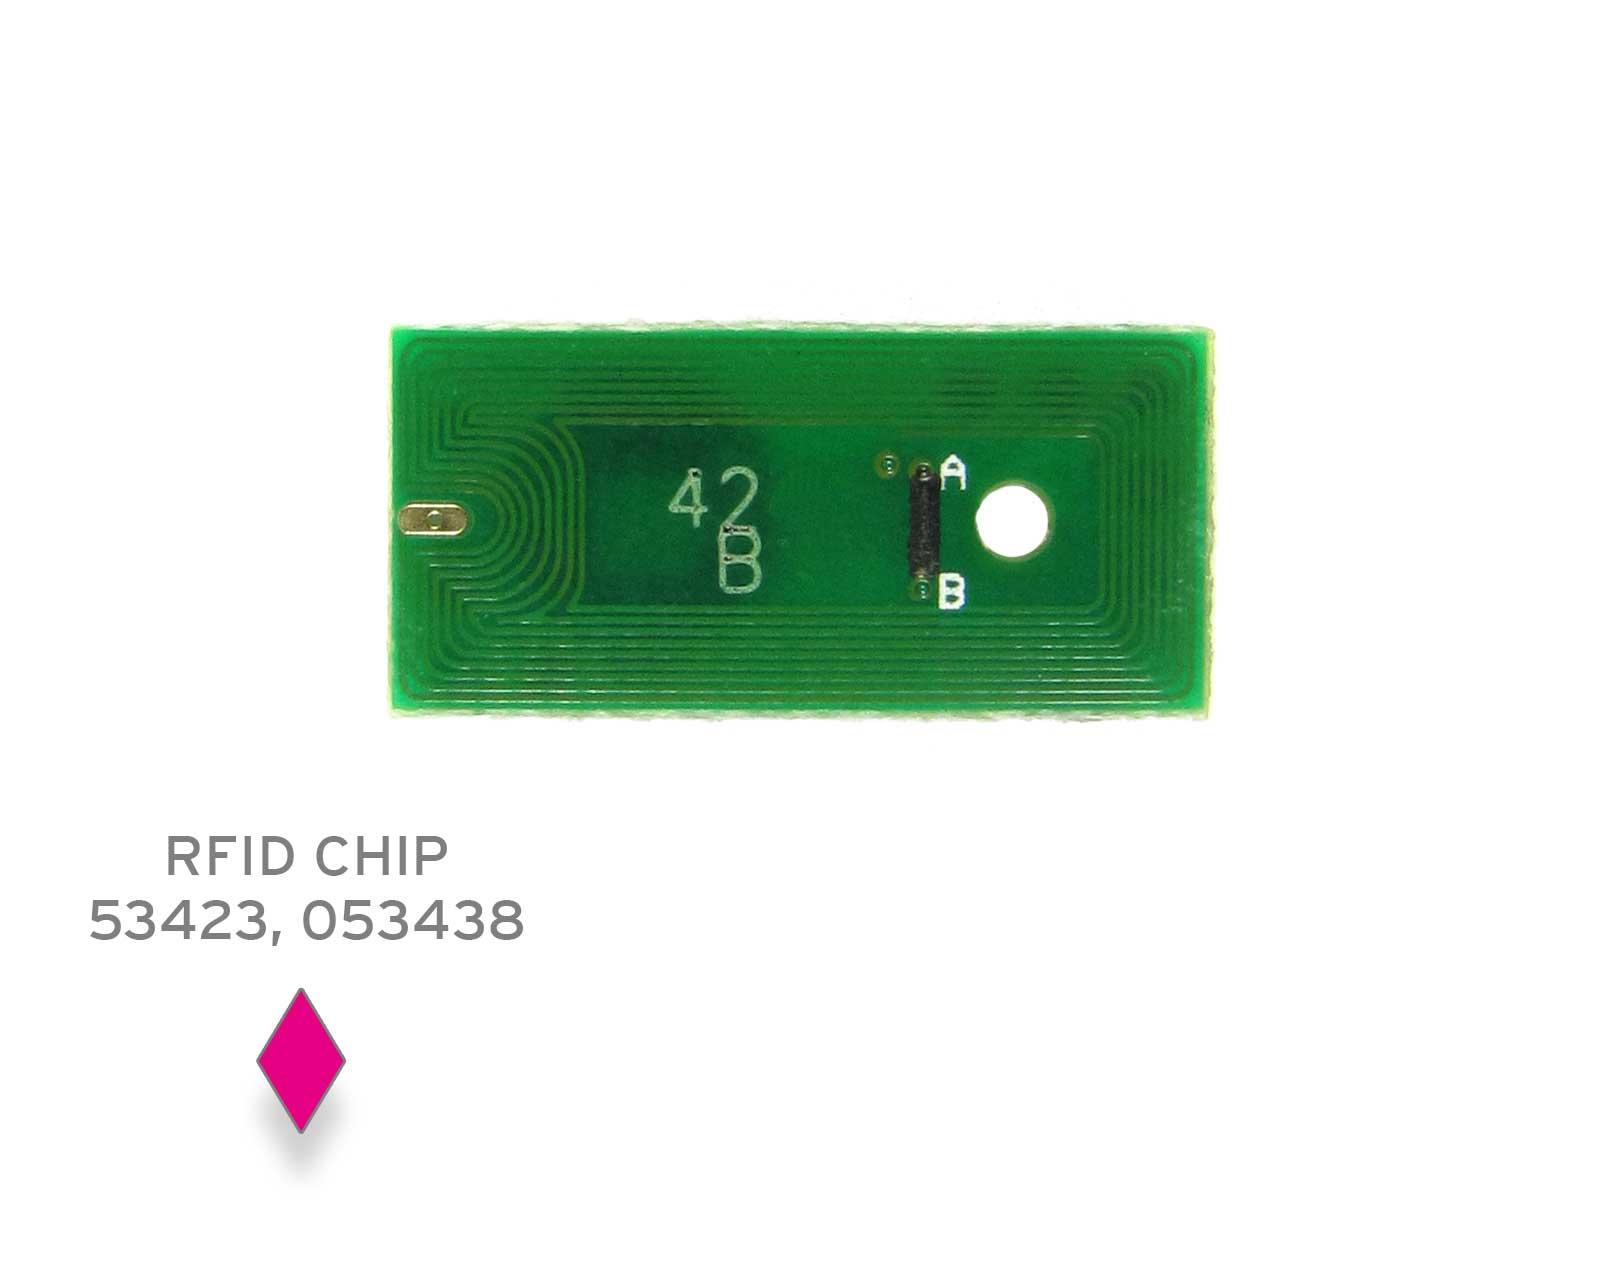 Chip for Primera LX 900 M magenta, single-use